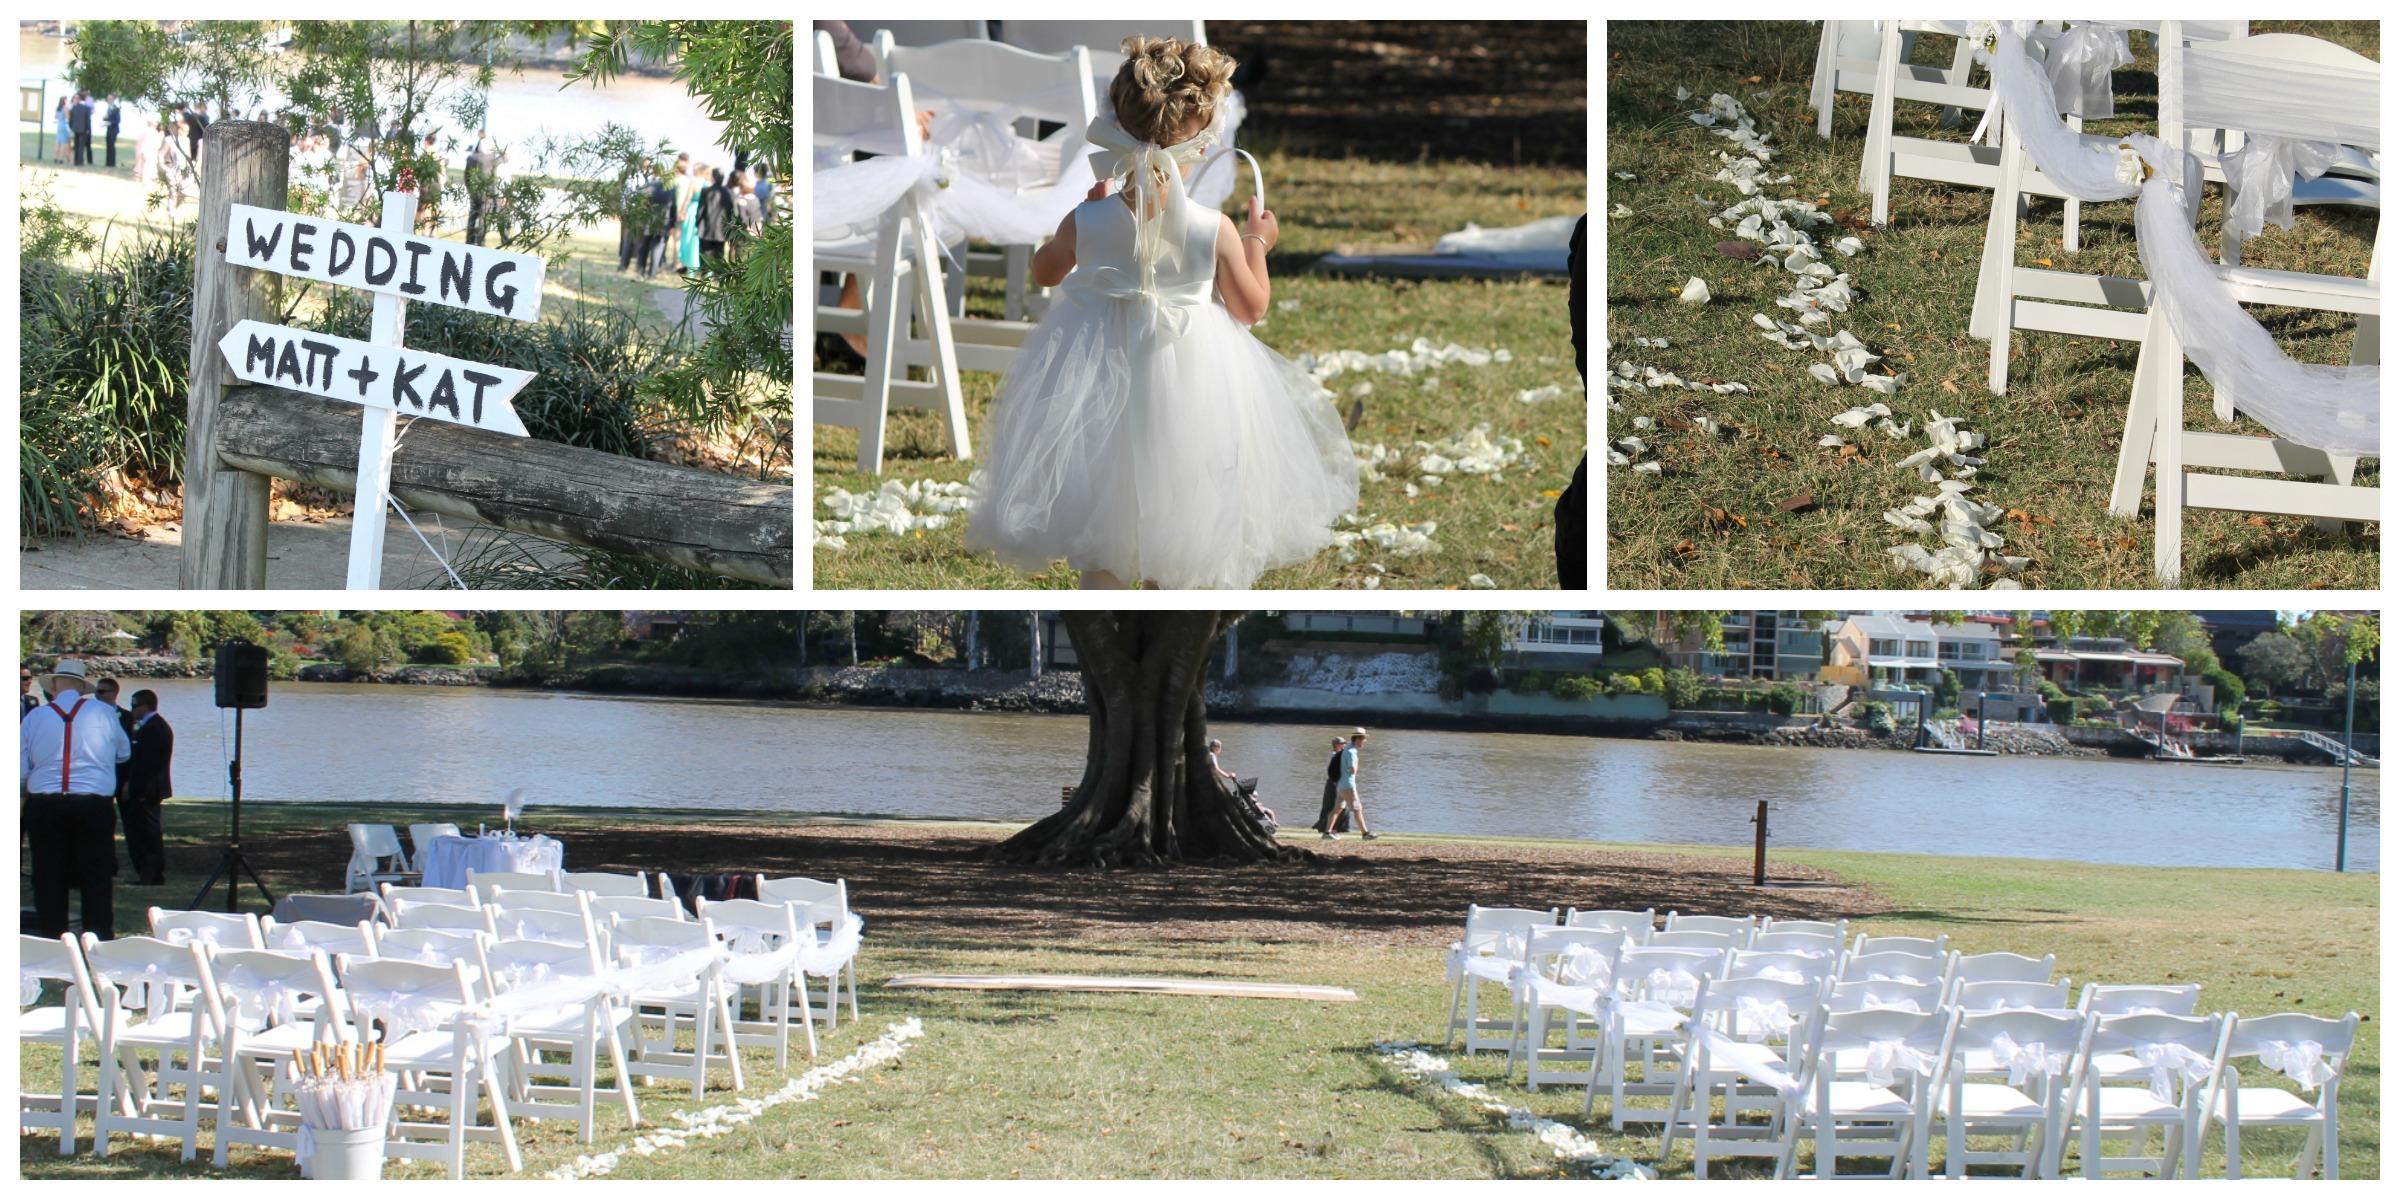 Lanham Wedding - October 2013